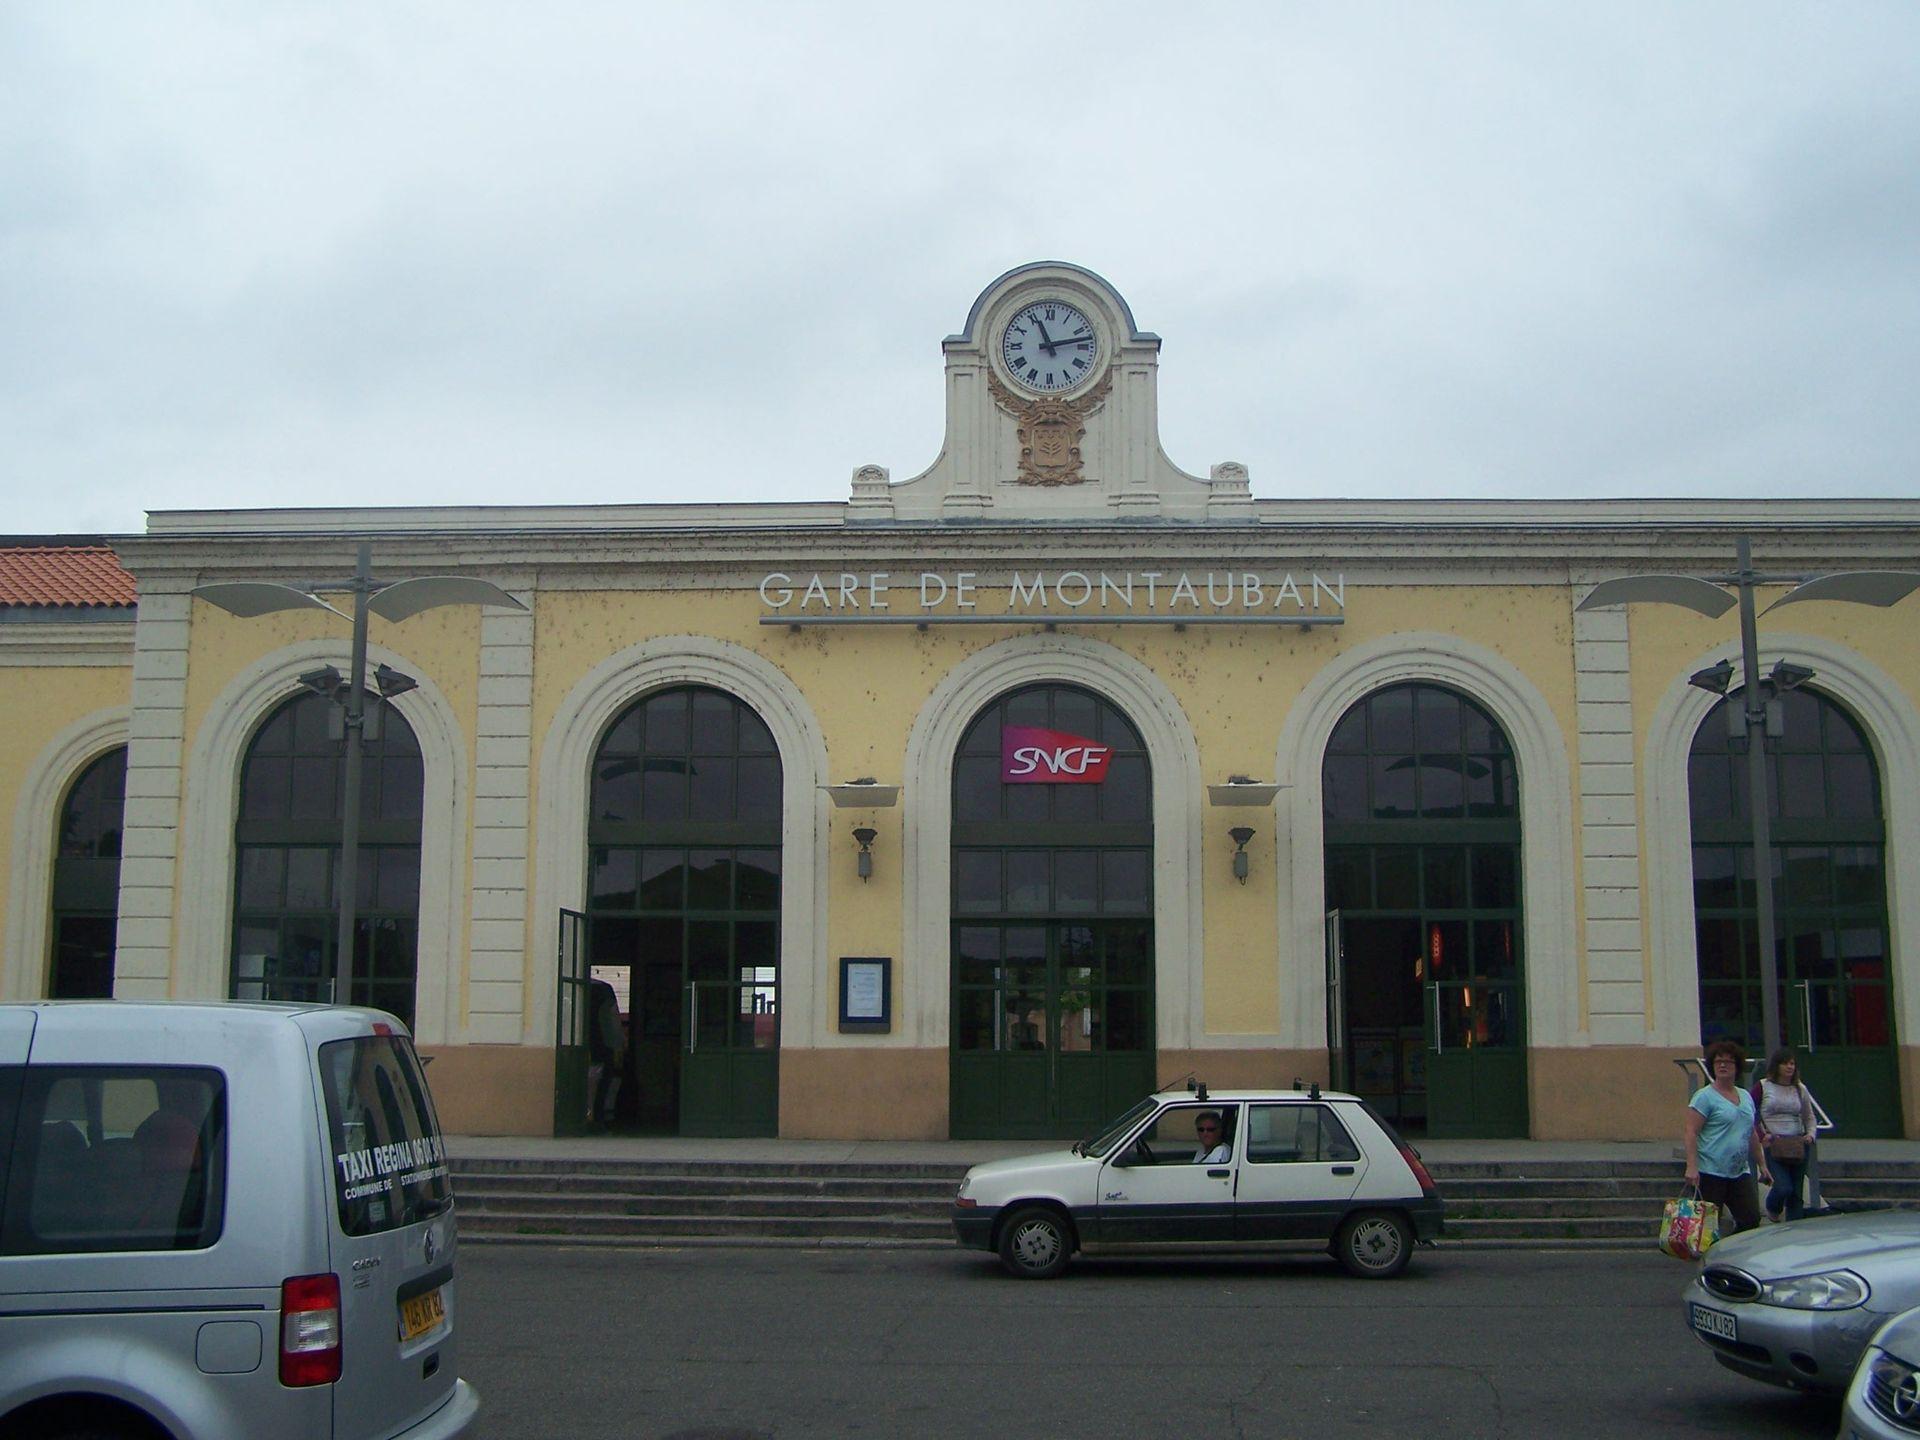 Gare de montauban ville bourbon wikip dia for Piscine de montauban